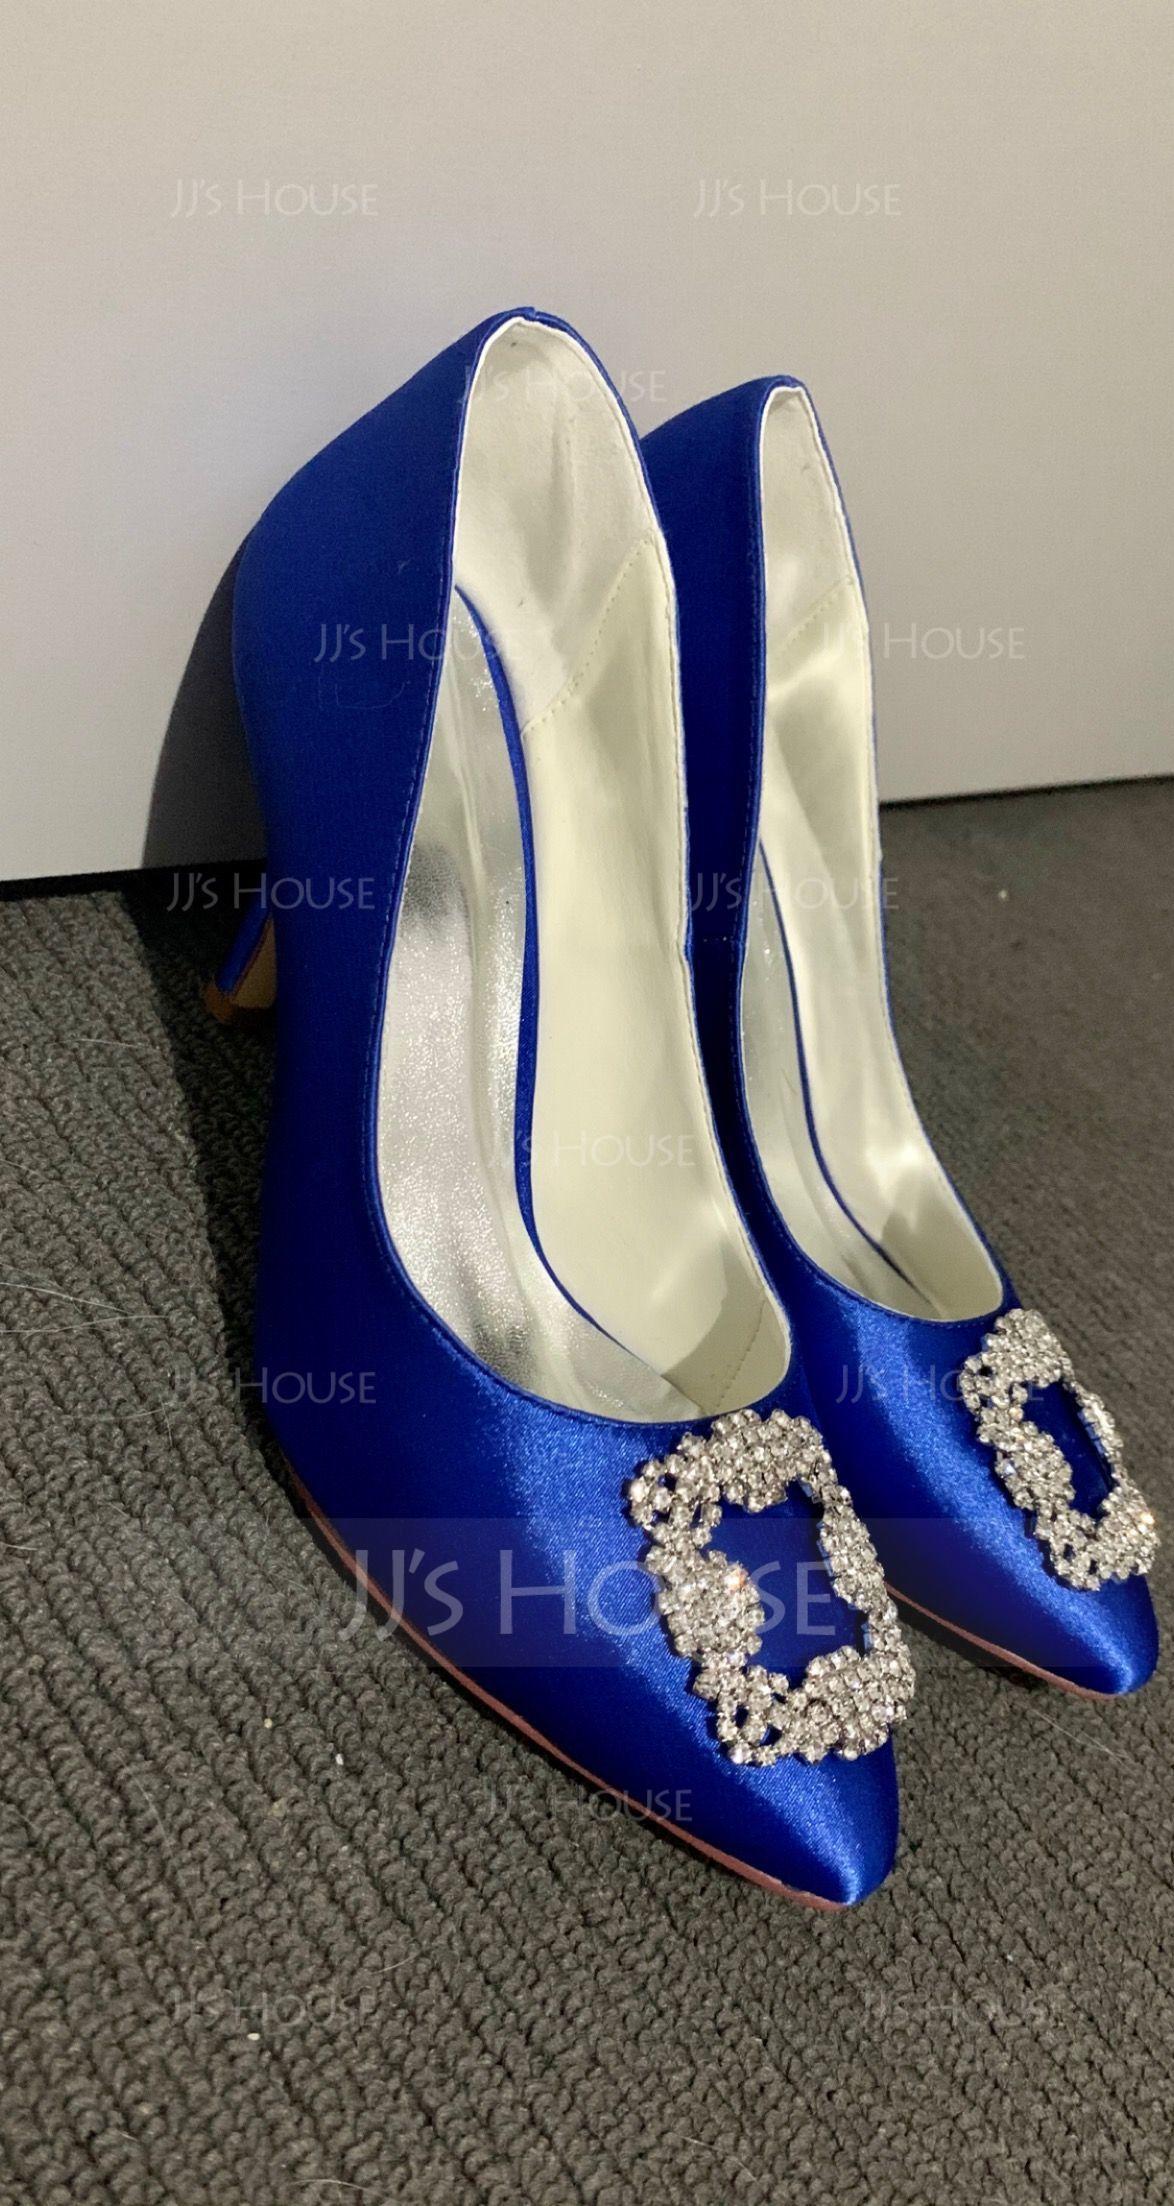 Women's Satin Stiletto Heel Closed Toe Pumps With Rhinestone (273203798)